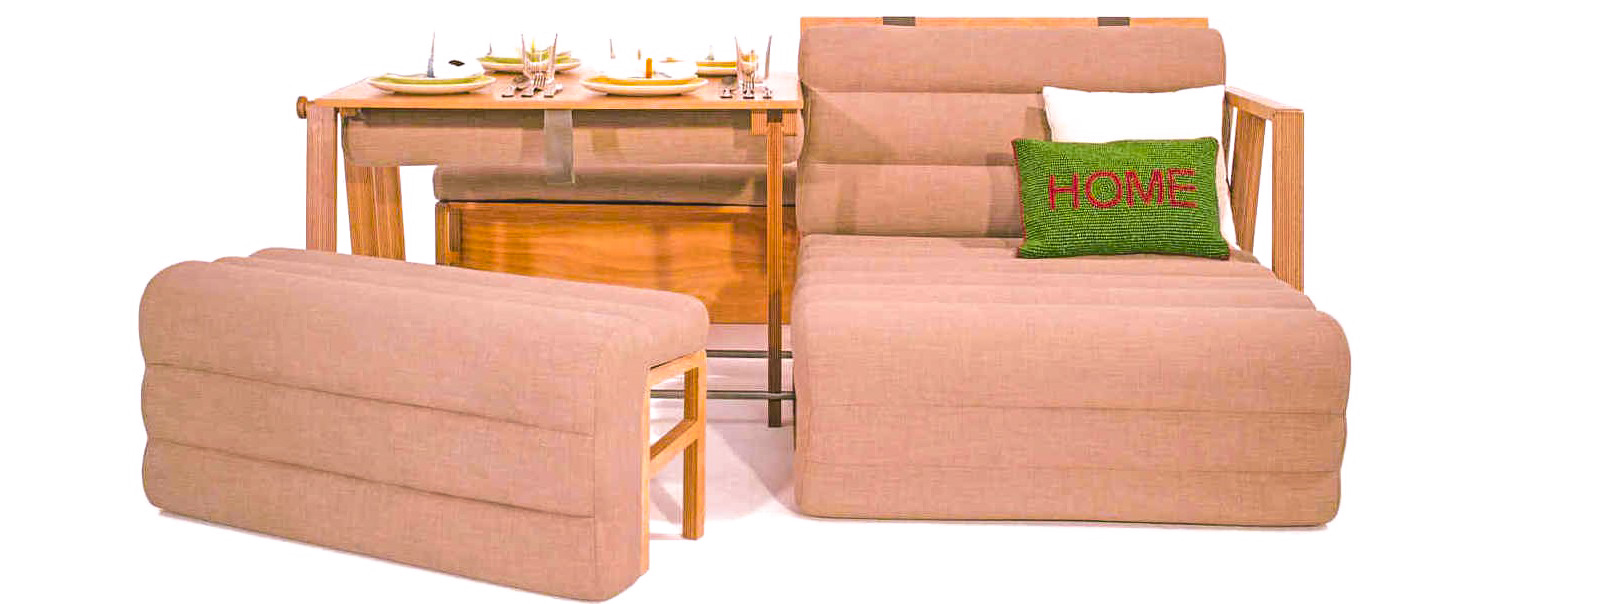 3Moods - унікальні меблі-трансформер All-In-One